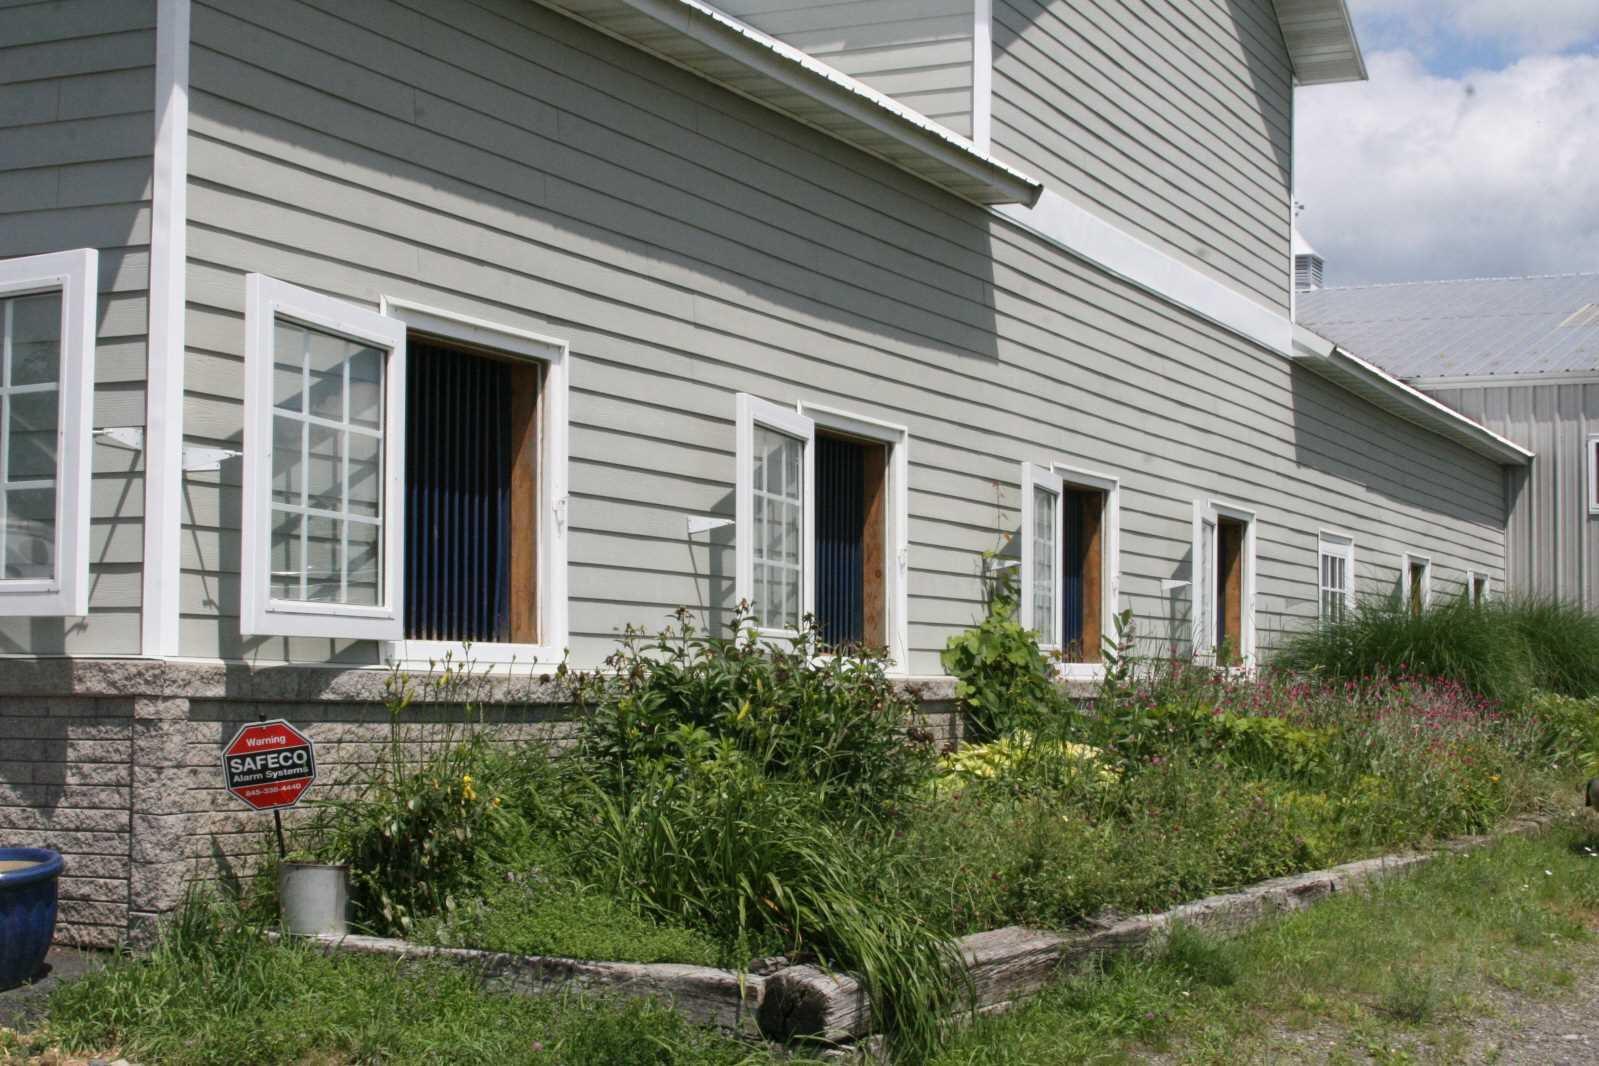 430 W KERLEY CORNERS, Red Hook, NY 12571